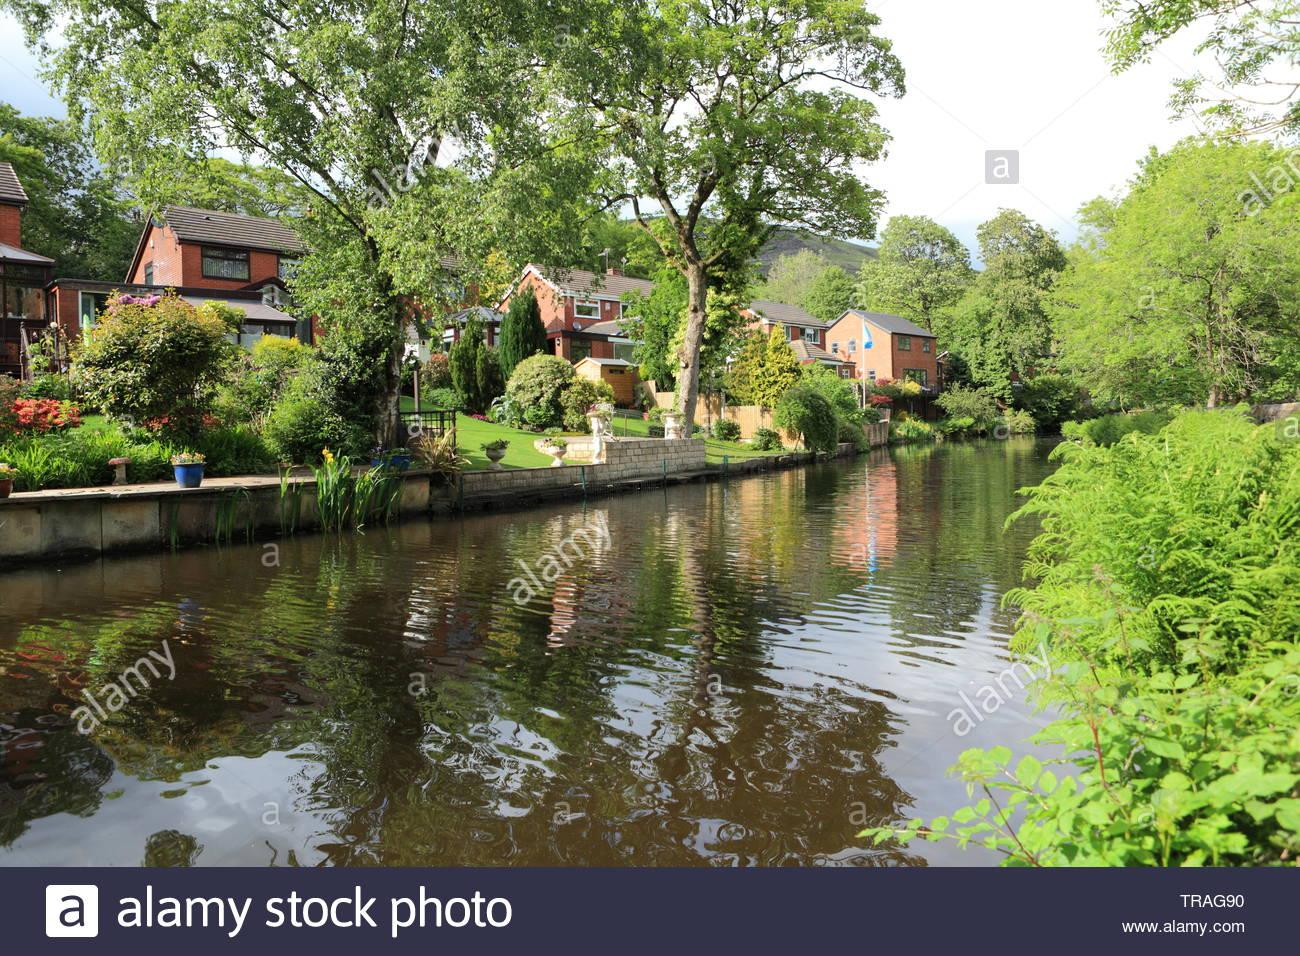 Beautiful Homes Along The Canal At Greenfield Saddleworth UK - Stock Image